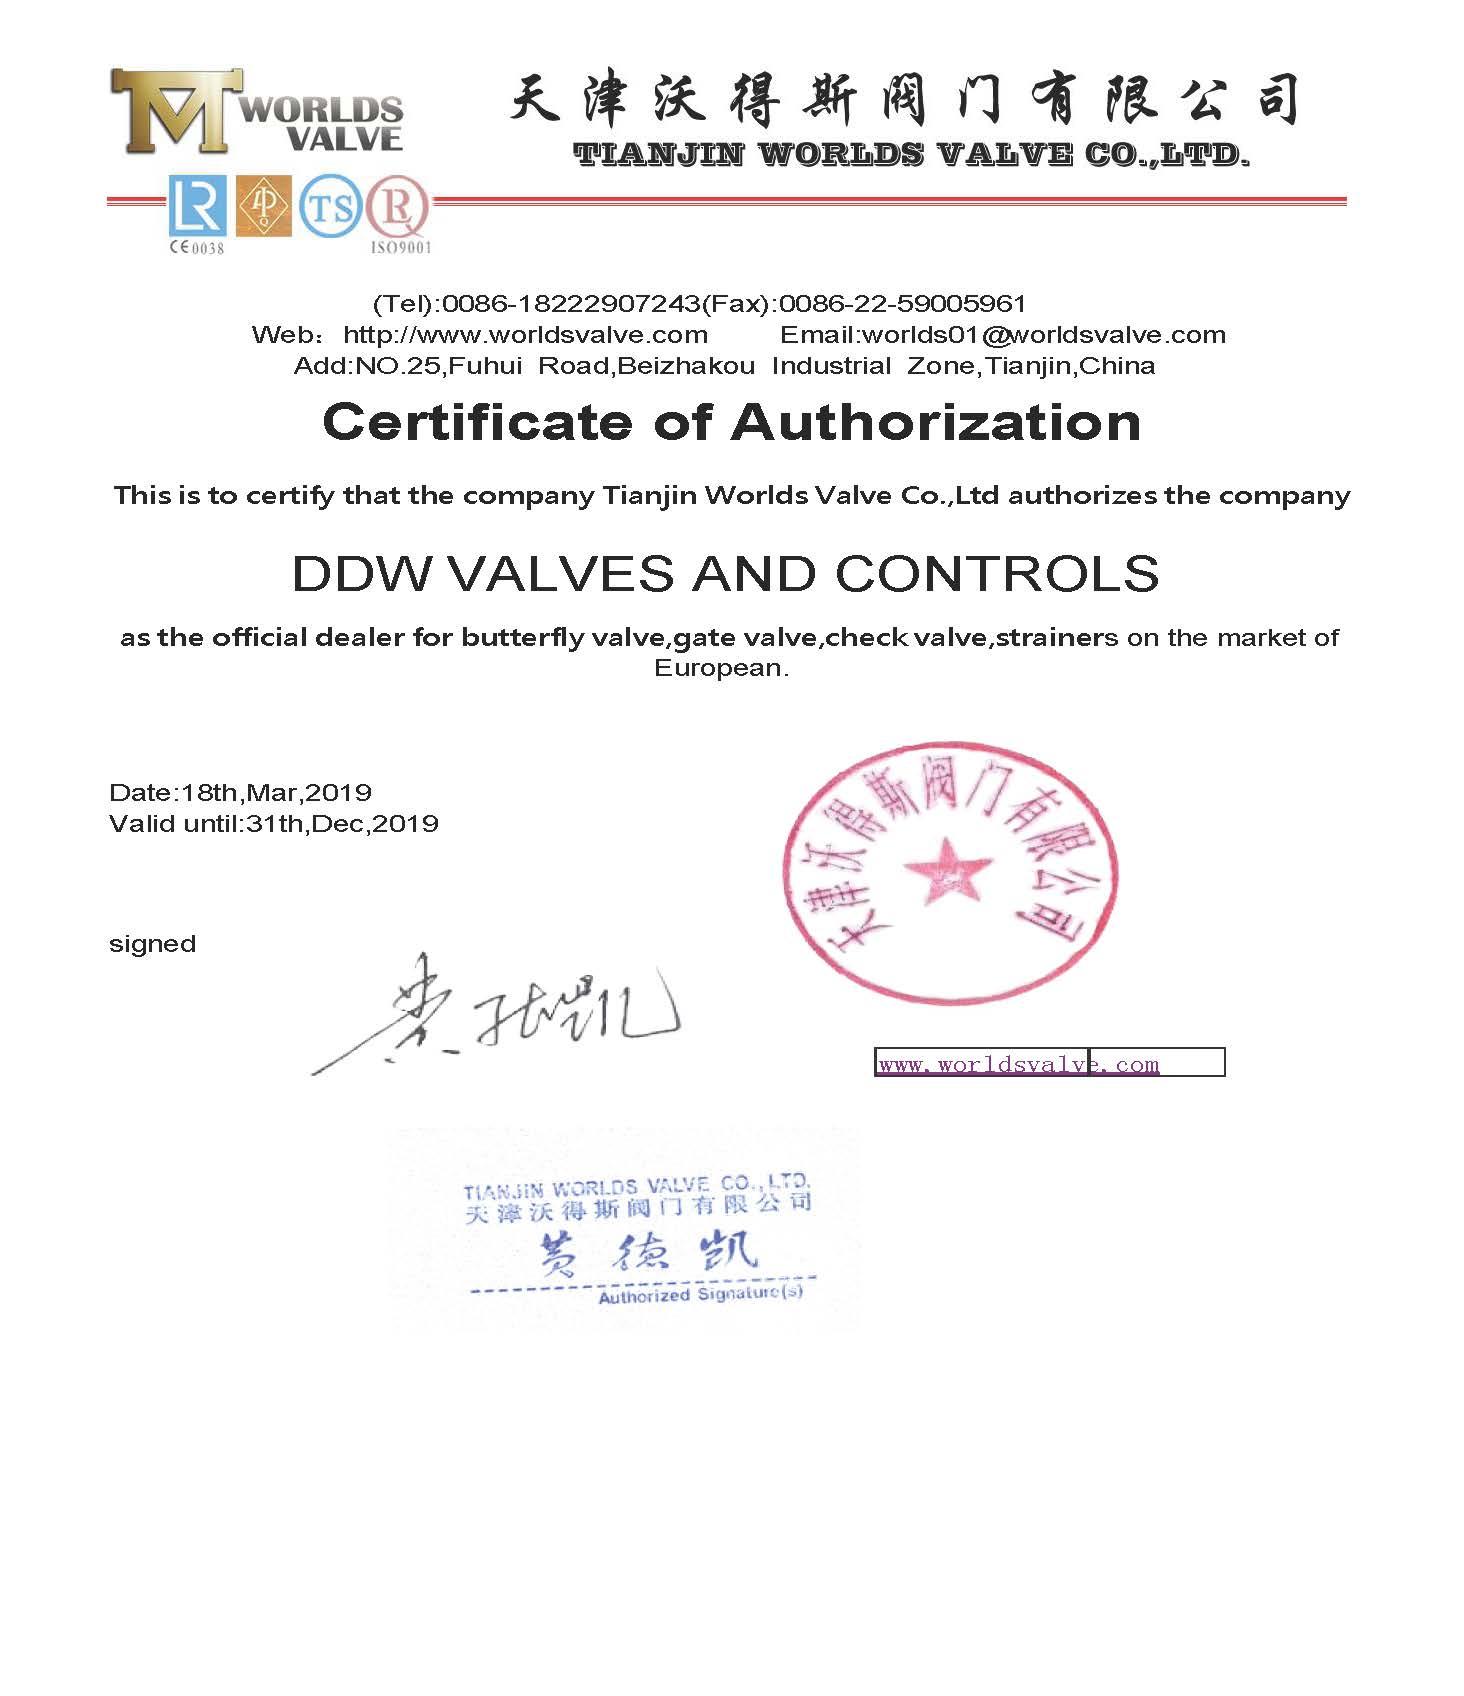 TIANJIN WORLDS VALVE Co., LTD